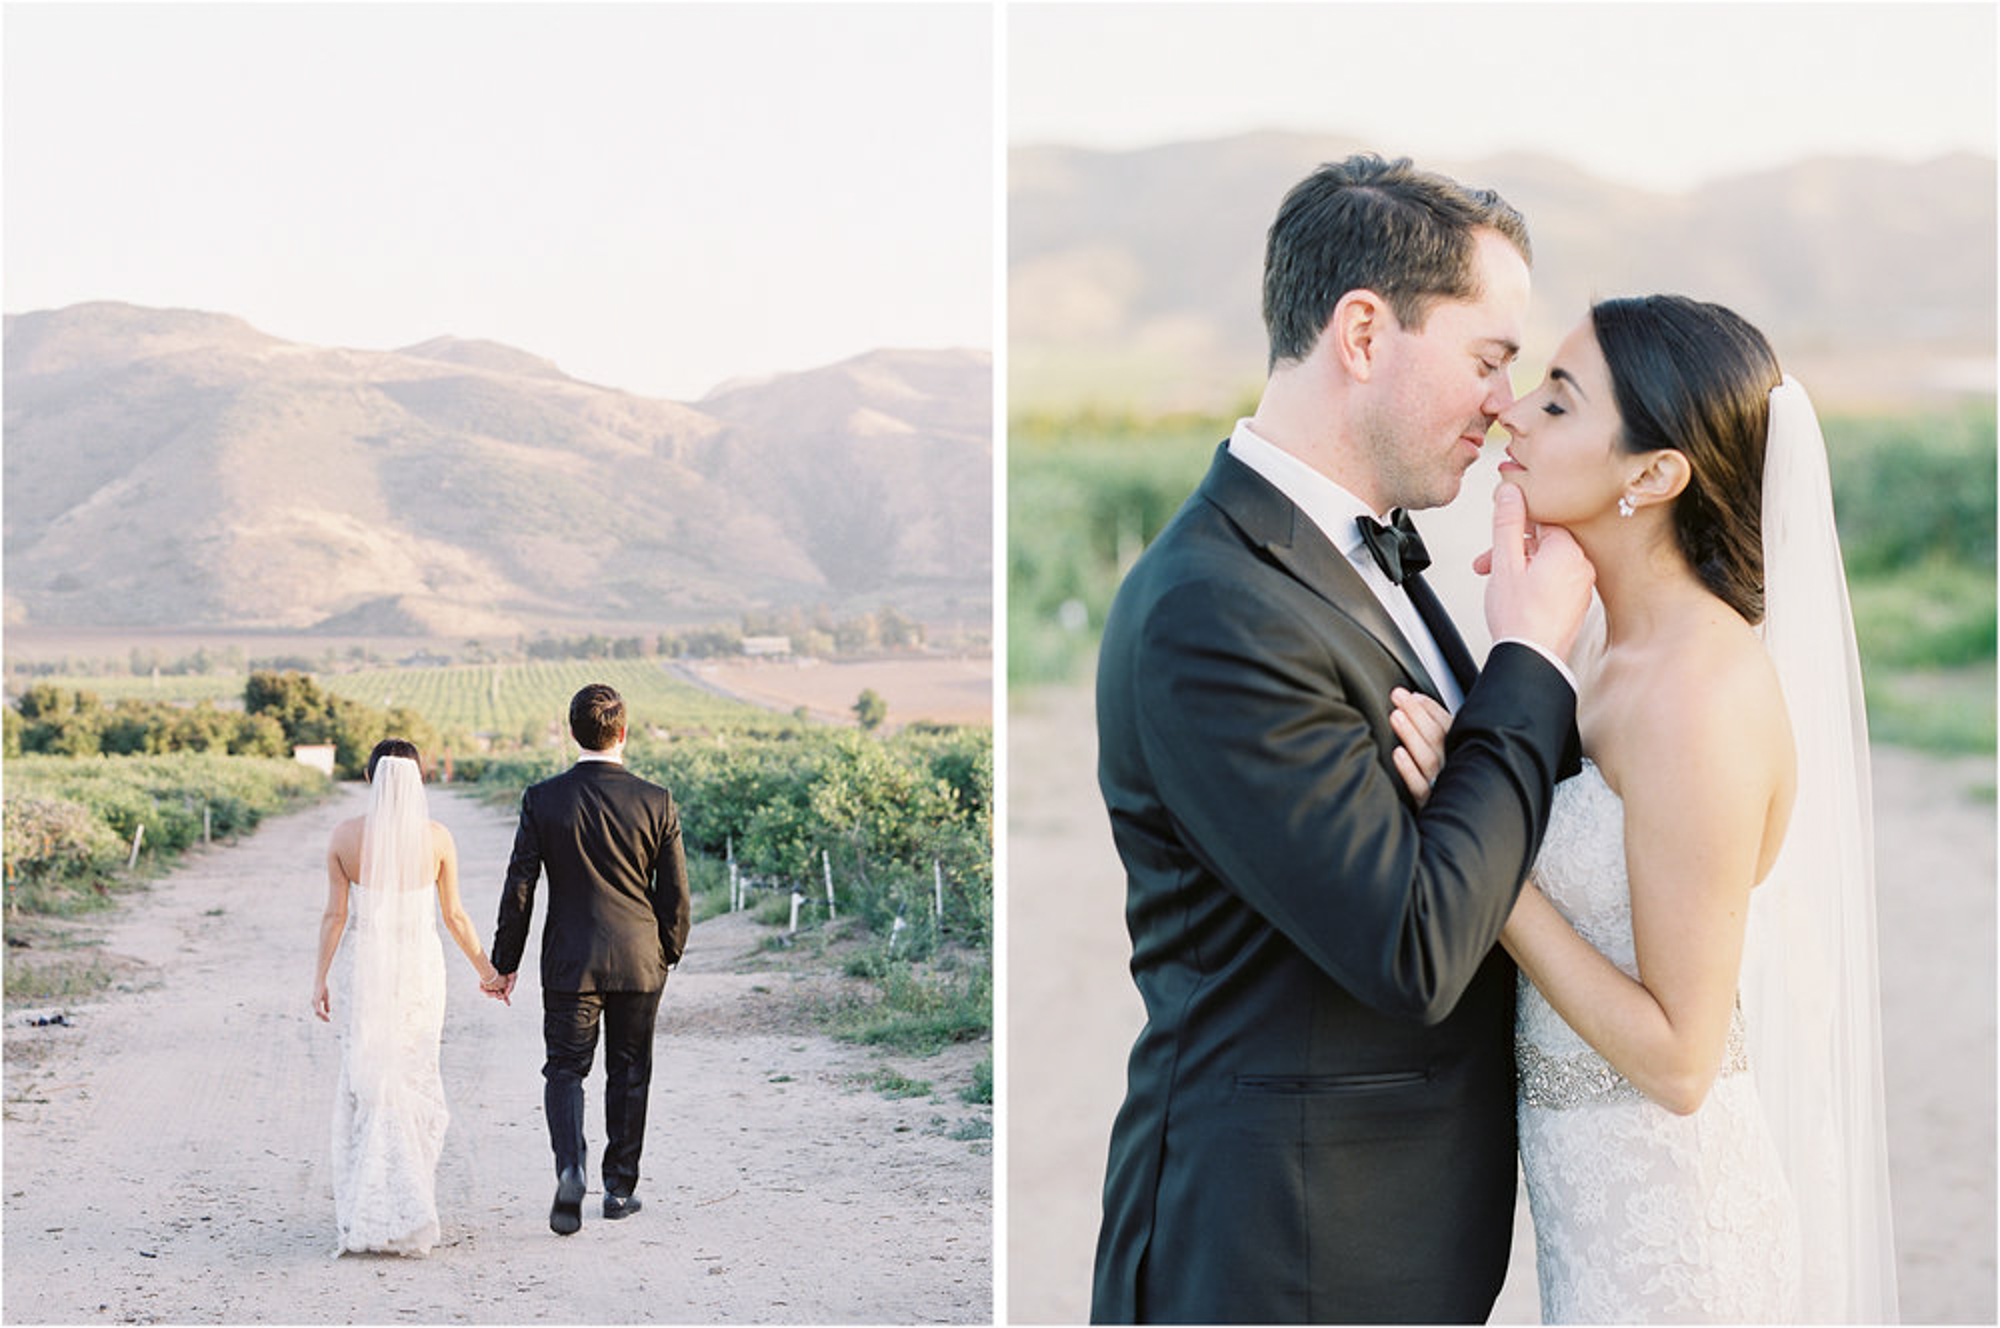 Gerry-Ranch-Wedding-Photography-Kristina-Adams-29.jpg